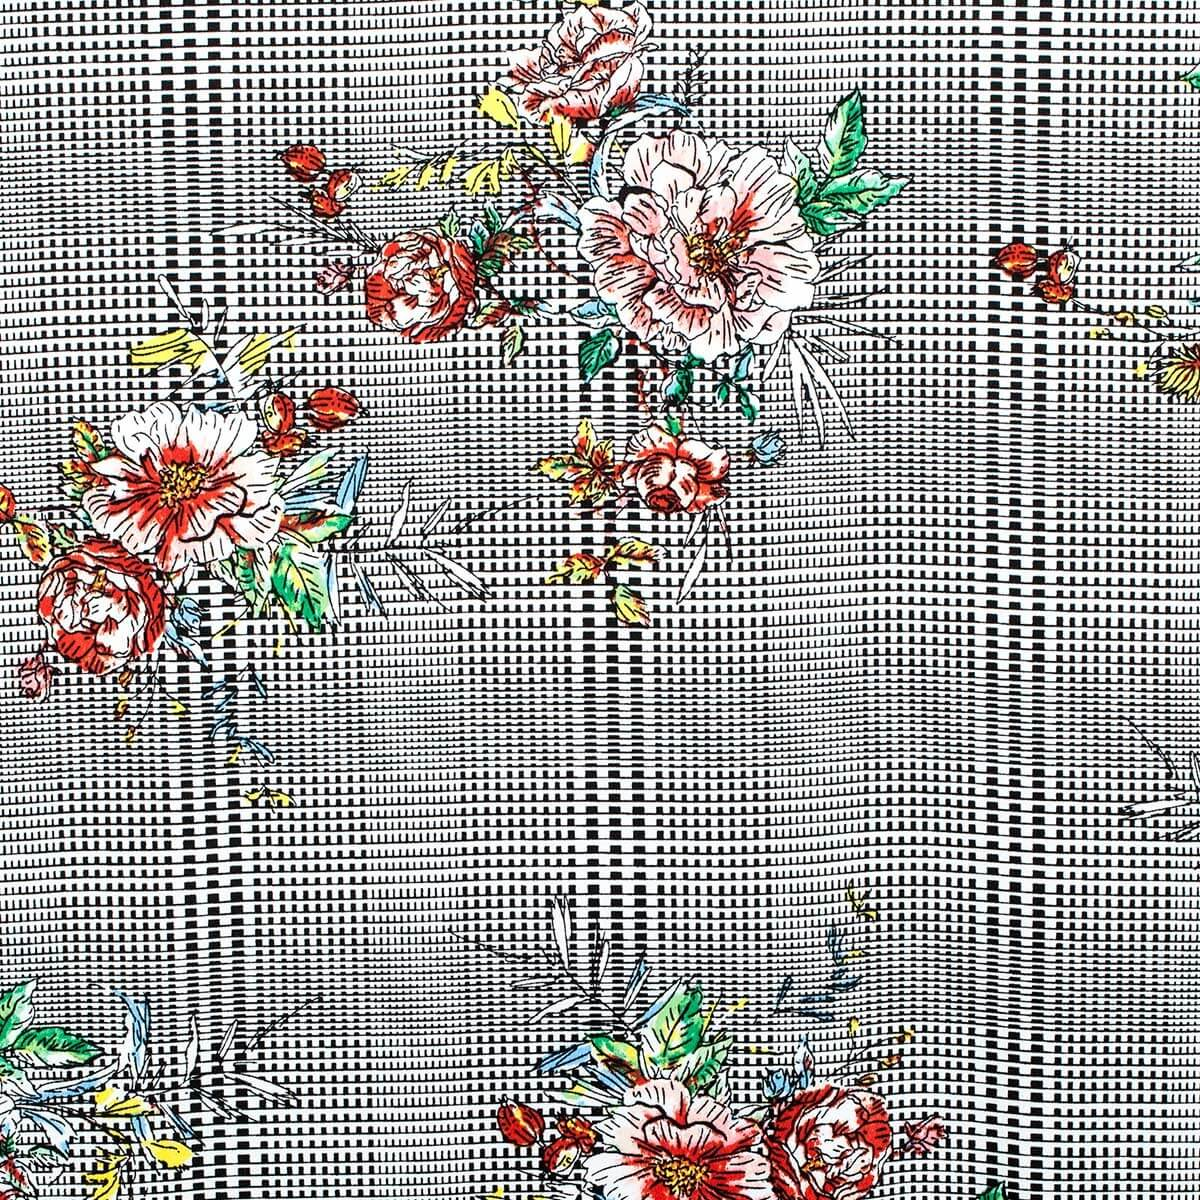 tissu carreaux fleurs classique multicolore. Black Bedroom Furniture Sets. Home Design Ideas